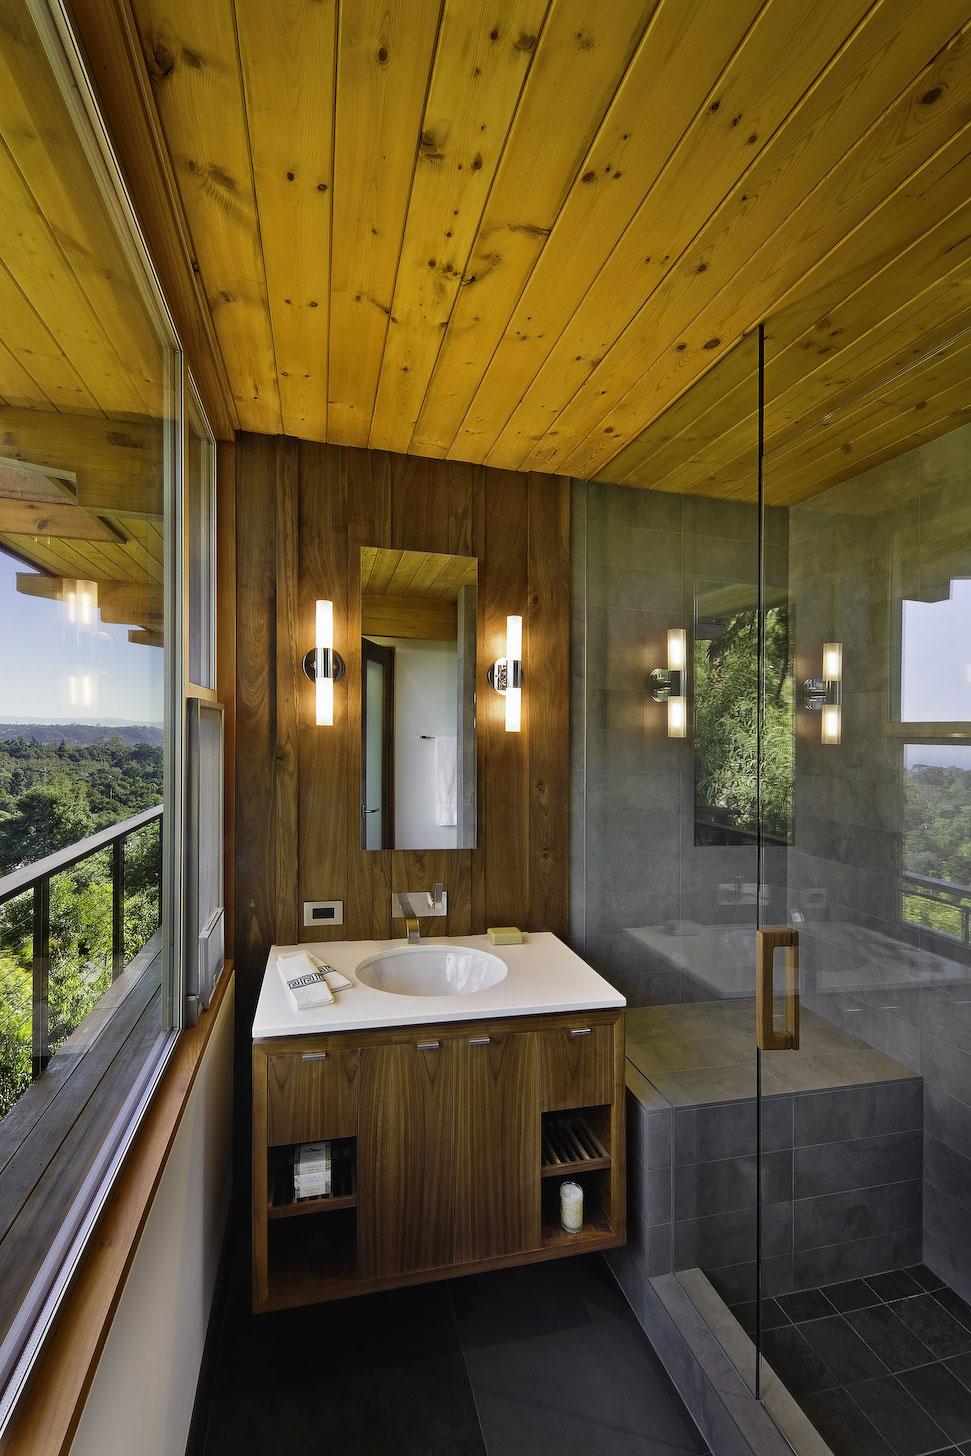 Sink, Shower, Mid-Century Modern Home in Santa Barbara, California